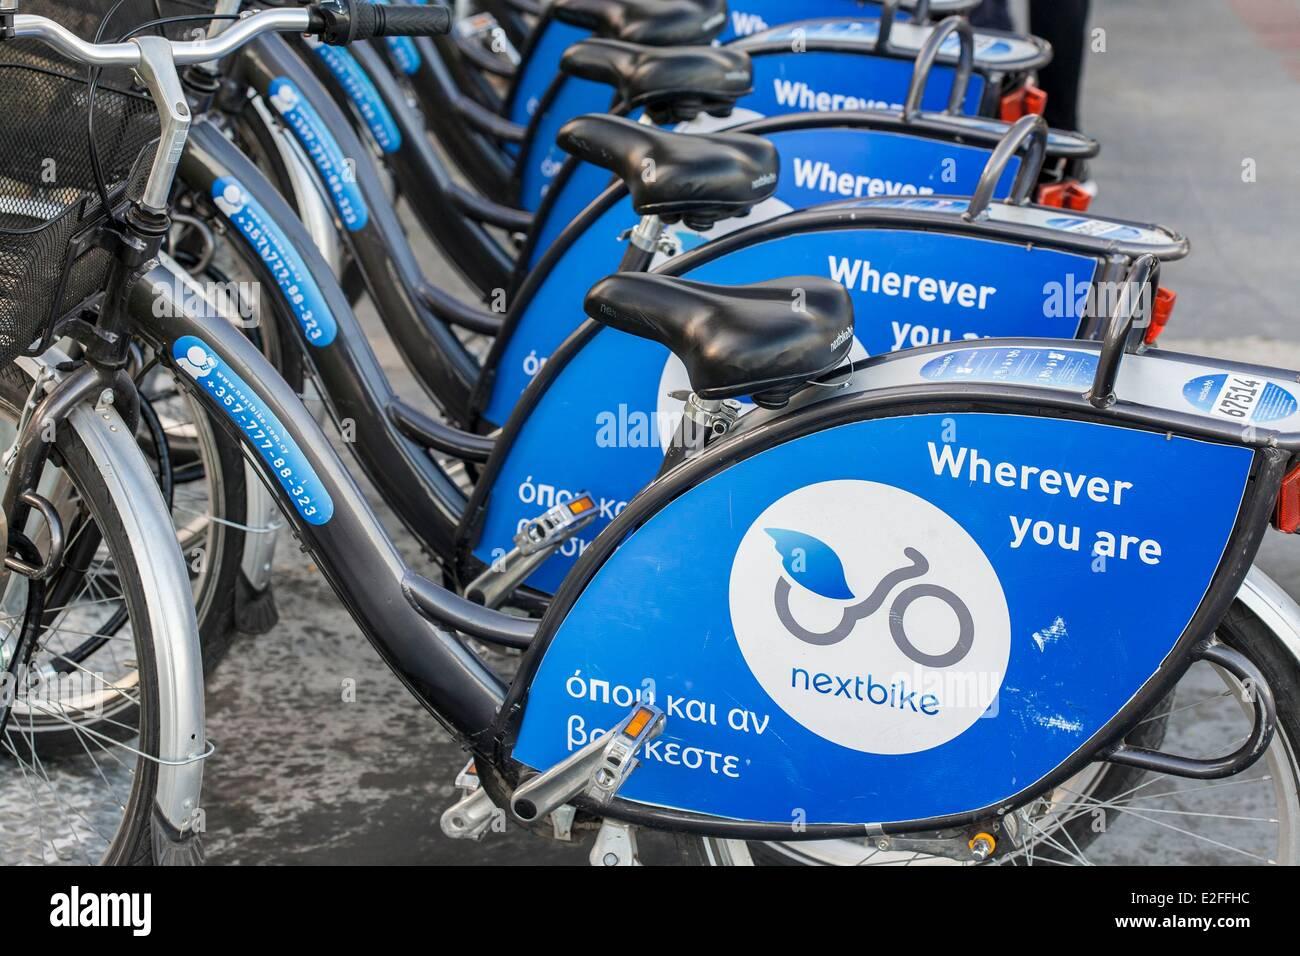 Cyprus, Limassol, Nextbike bicycles self-service - Stock Image